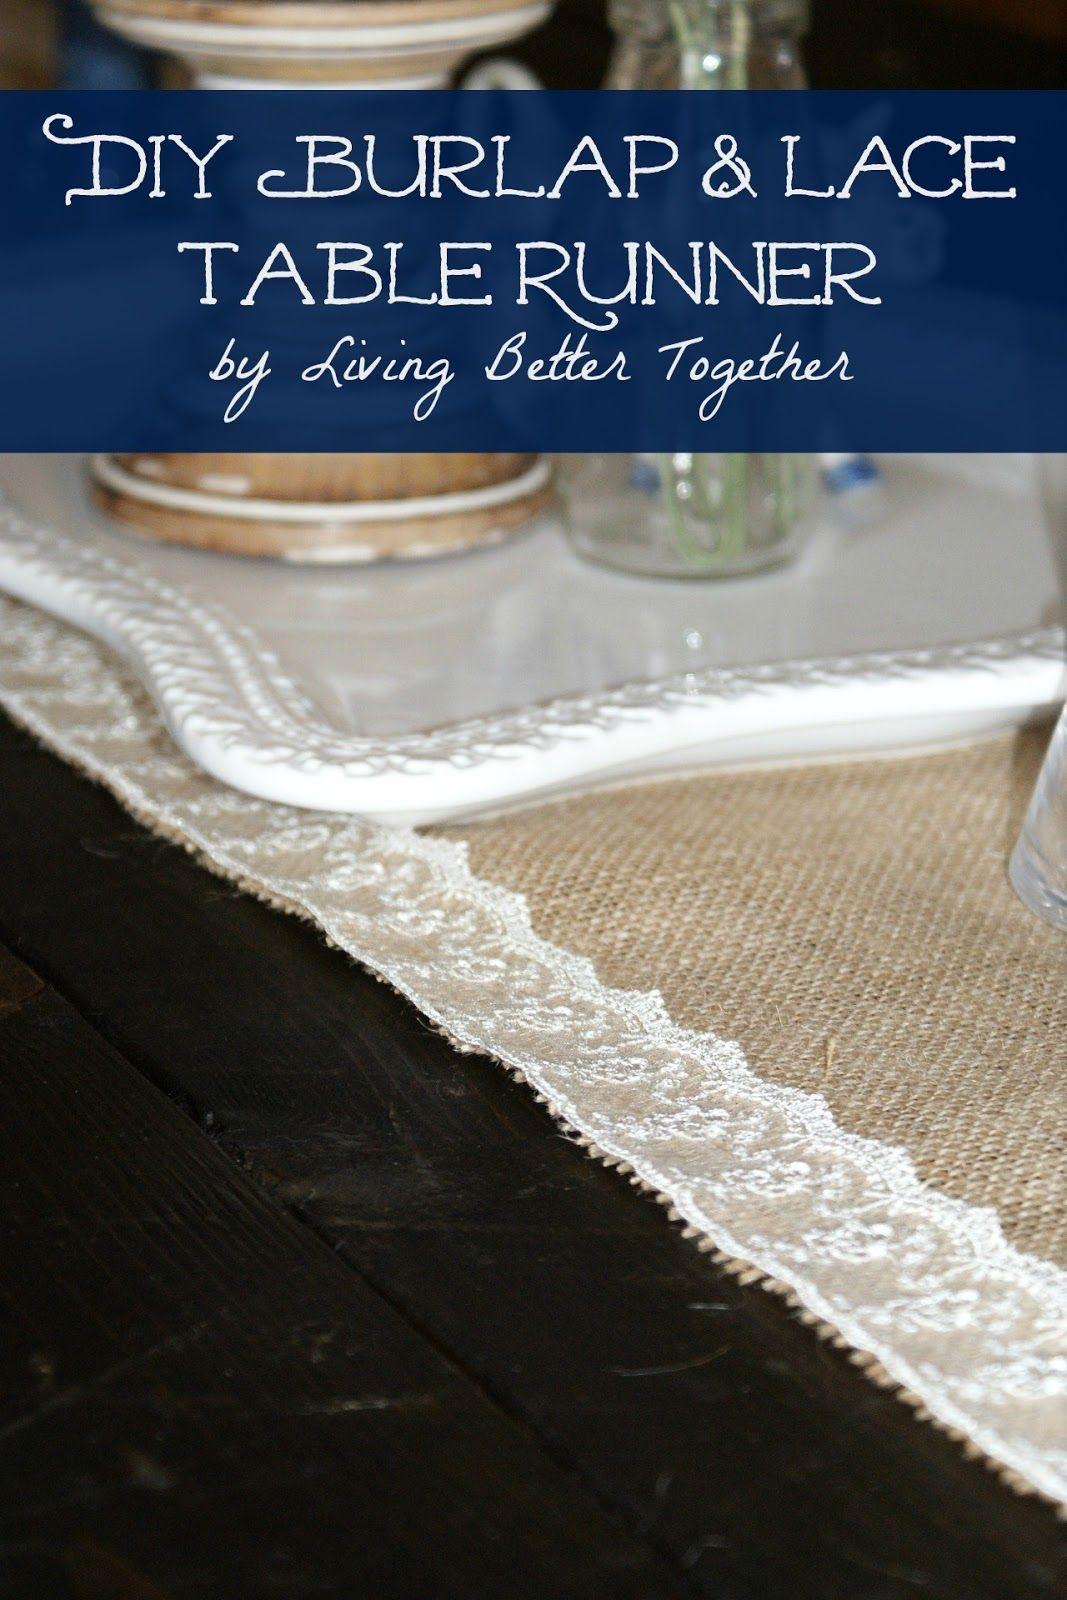 Diy Burlap Lace Table Runner Crafts